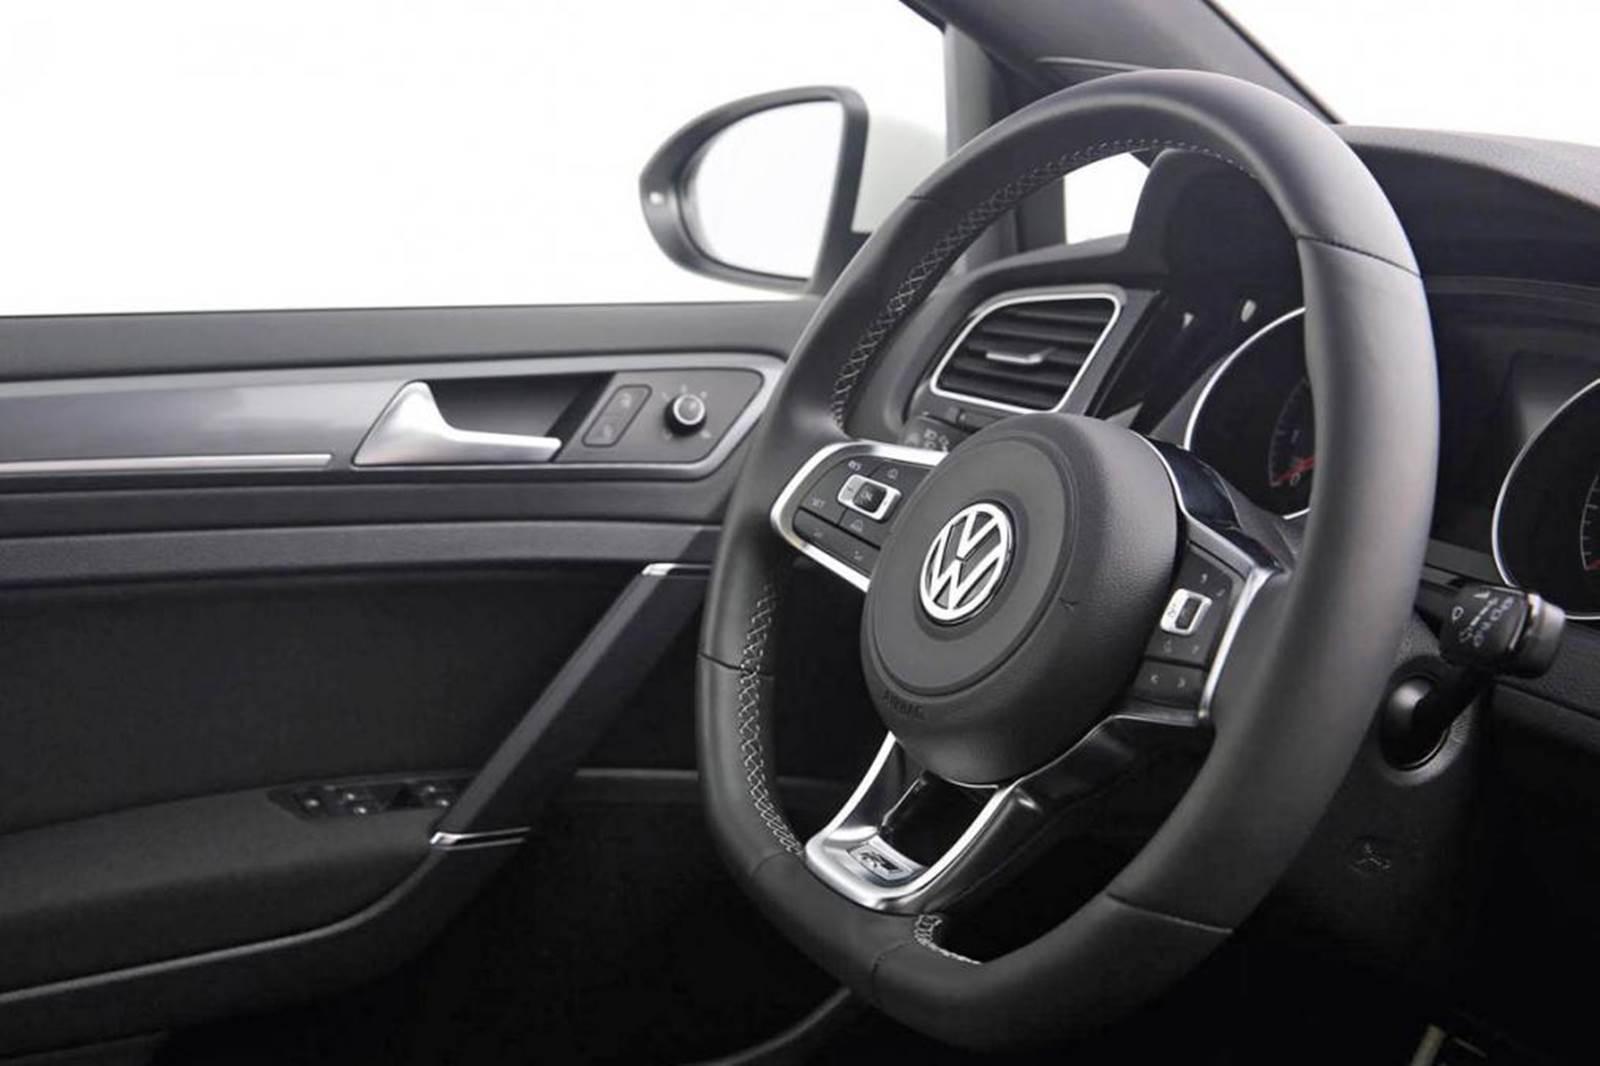 Volkswagen Golf TSI 2015 R-Line - interior